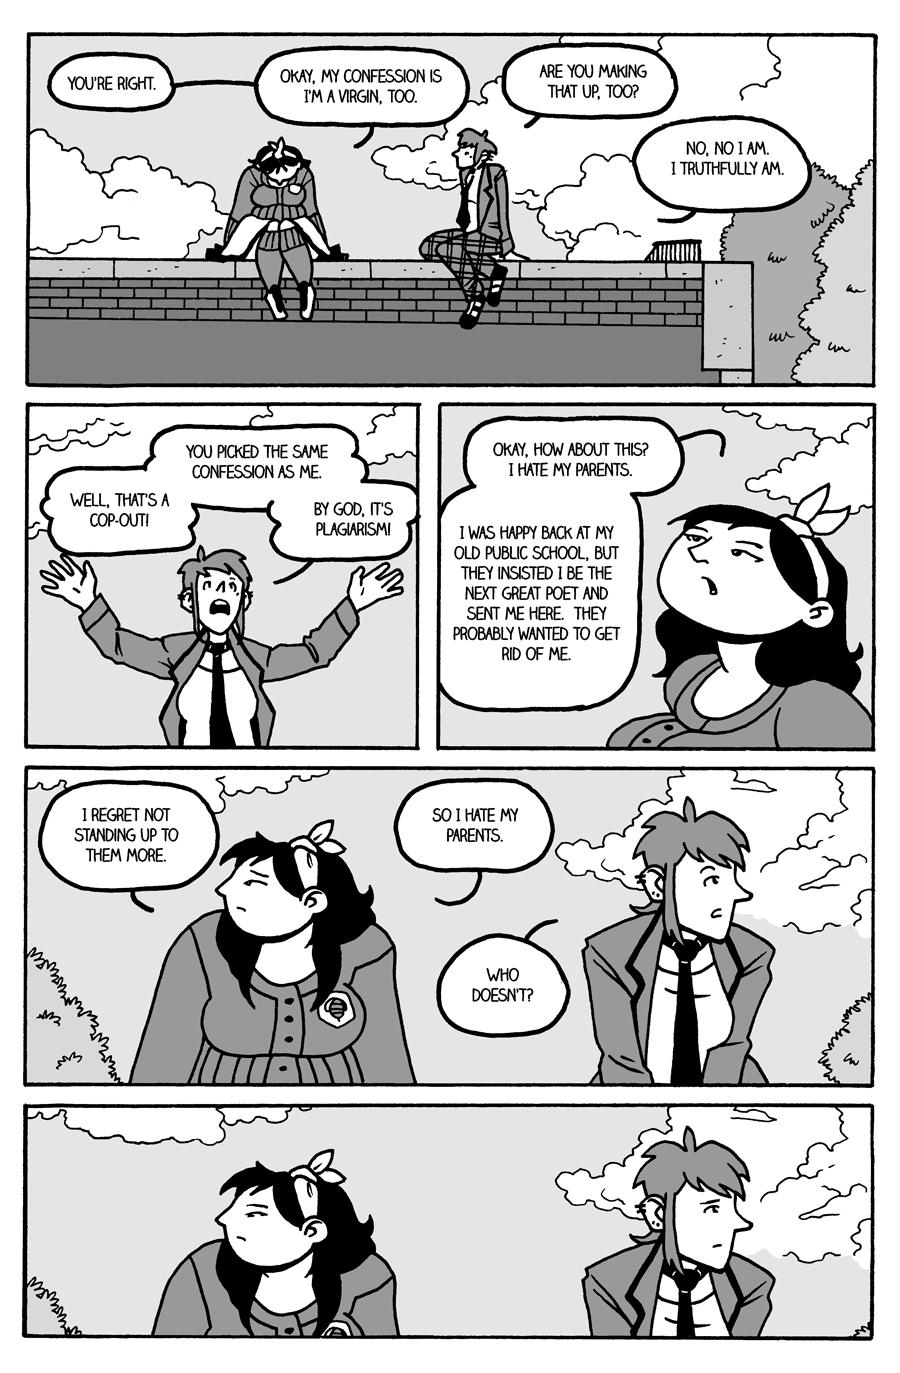 Carol & Rita page 8